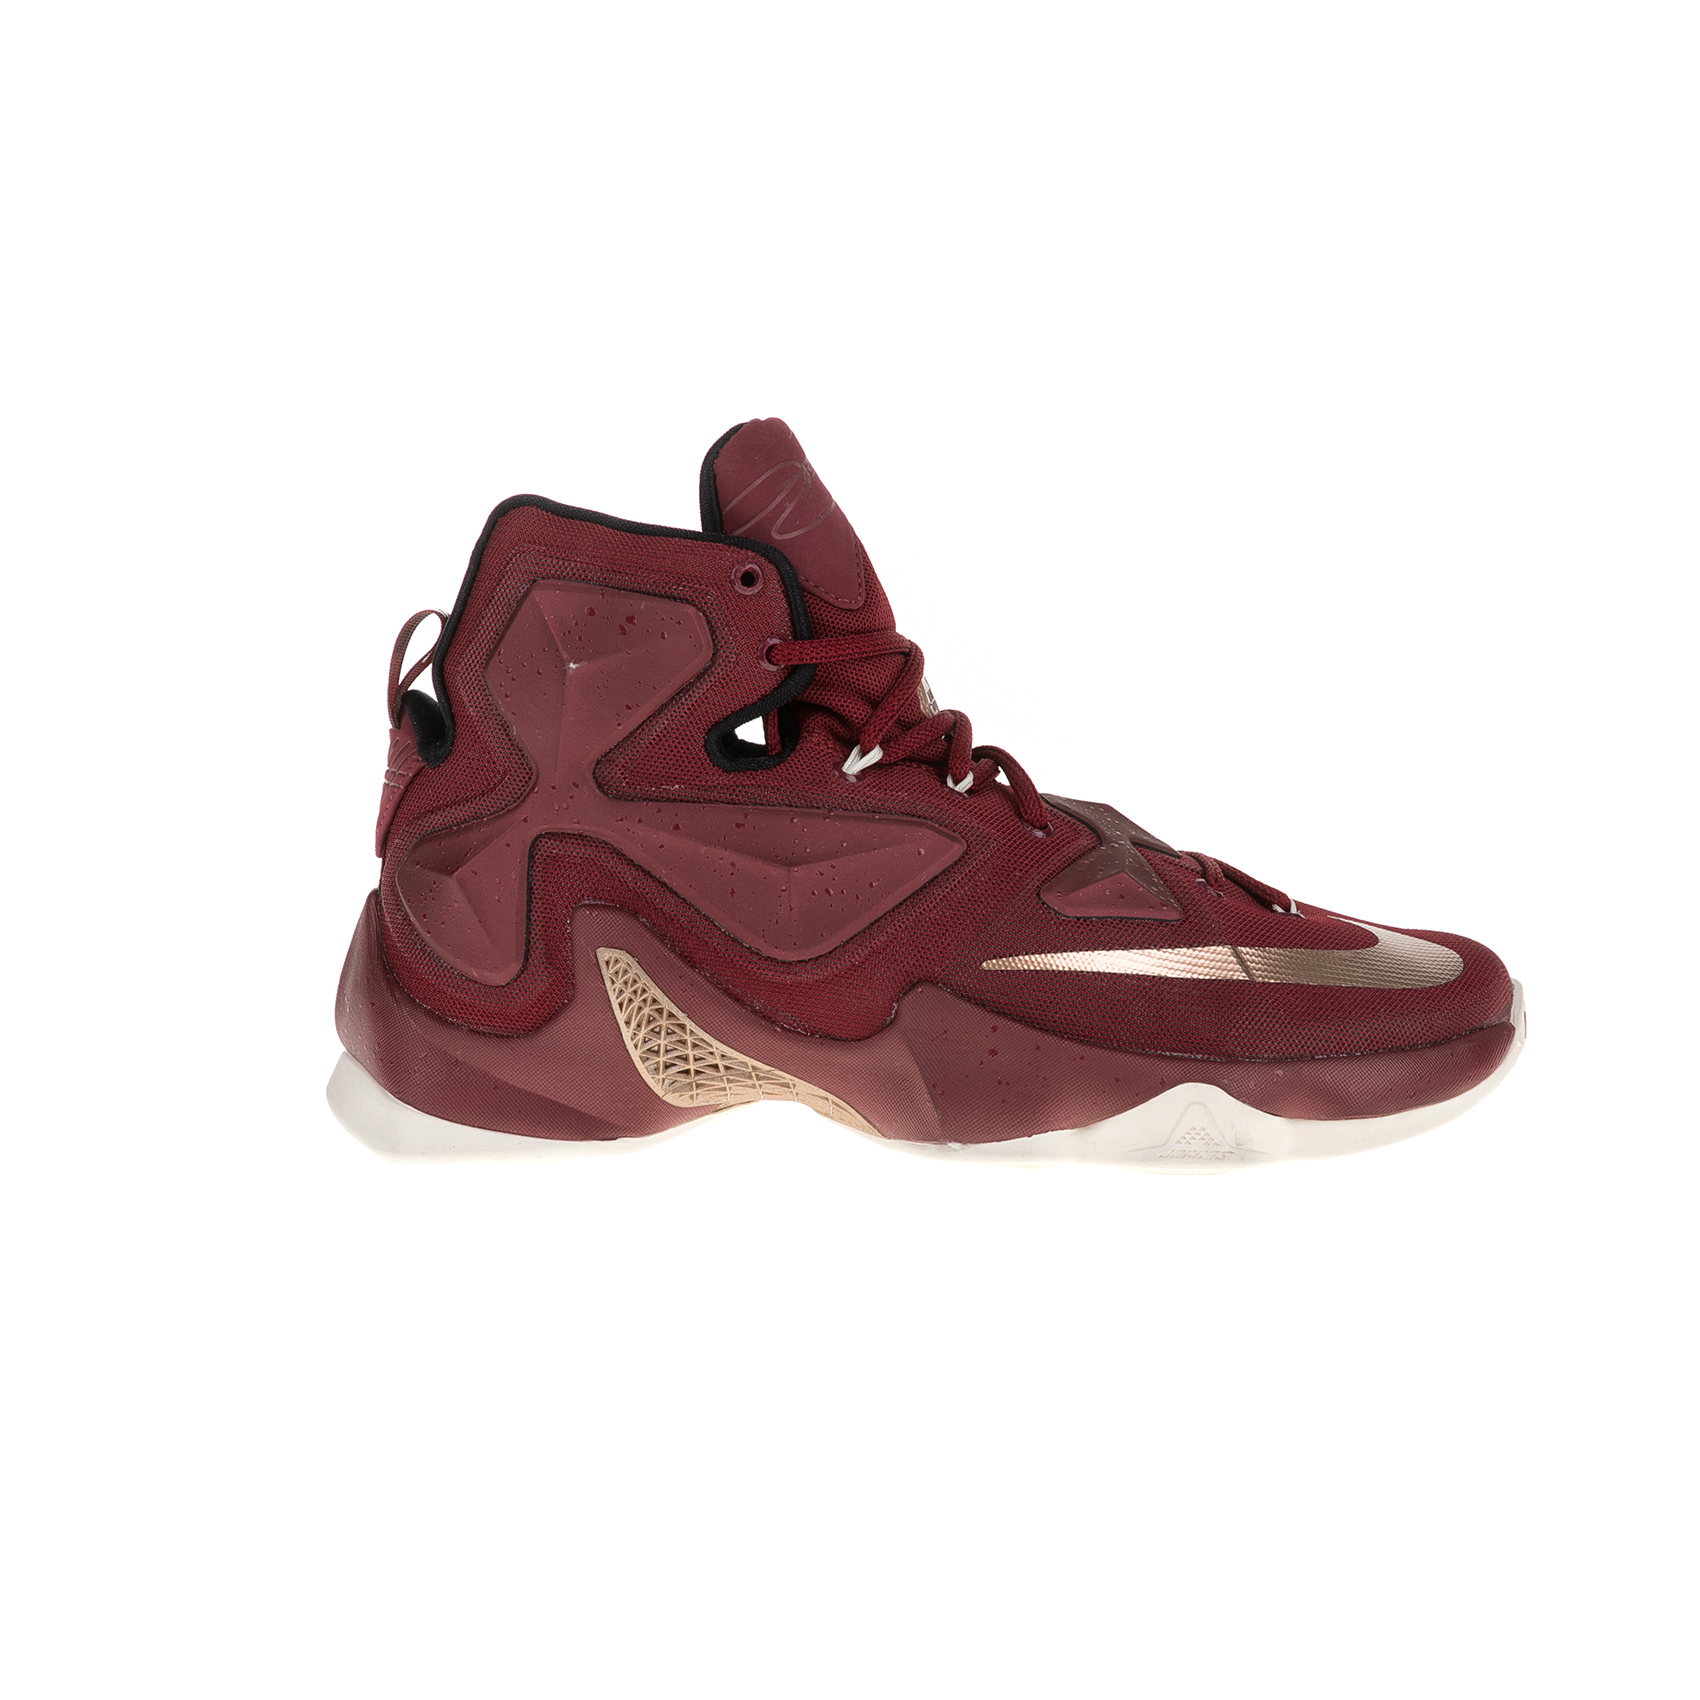 NIKE – Αντρικά παπούτσια NIKE LEBRON XIII μπορντό